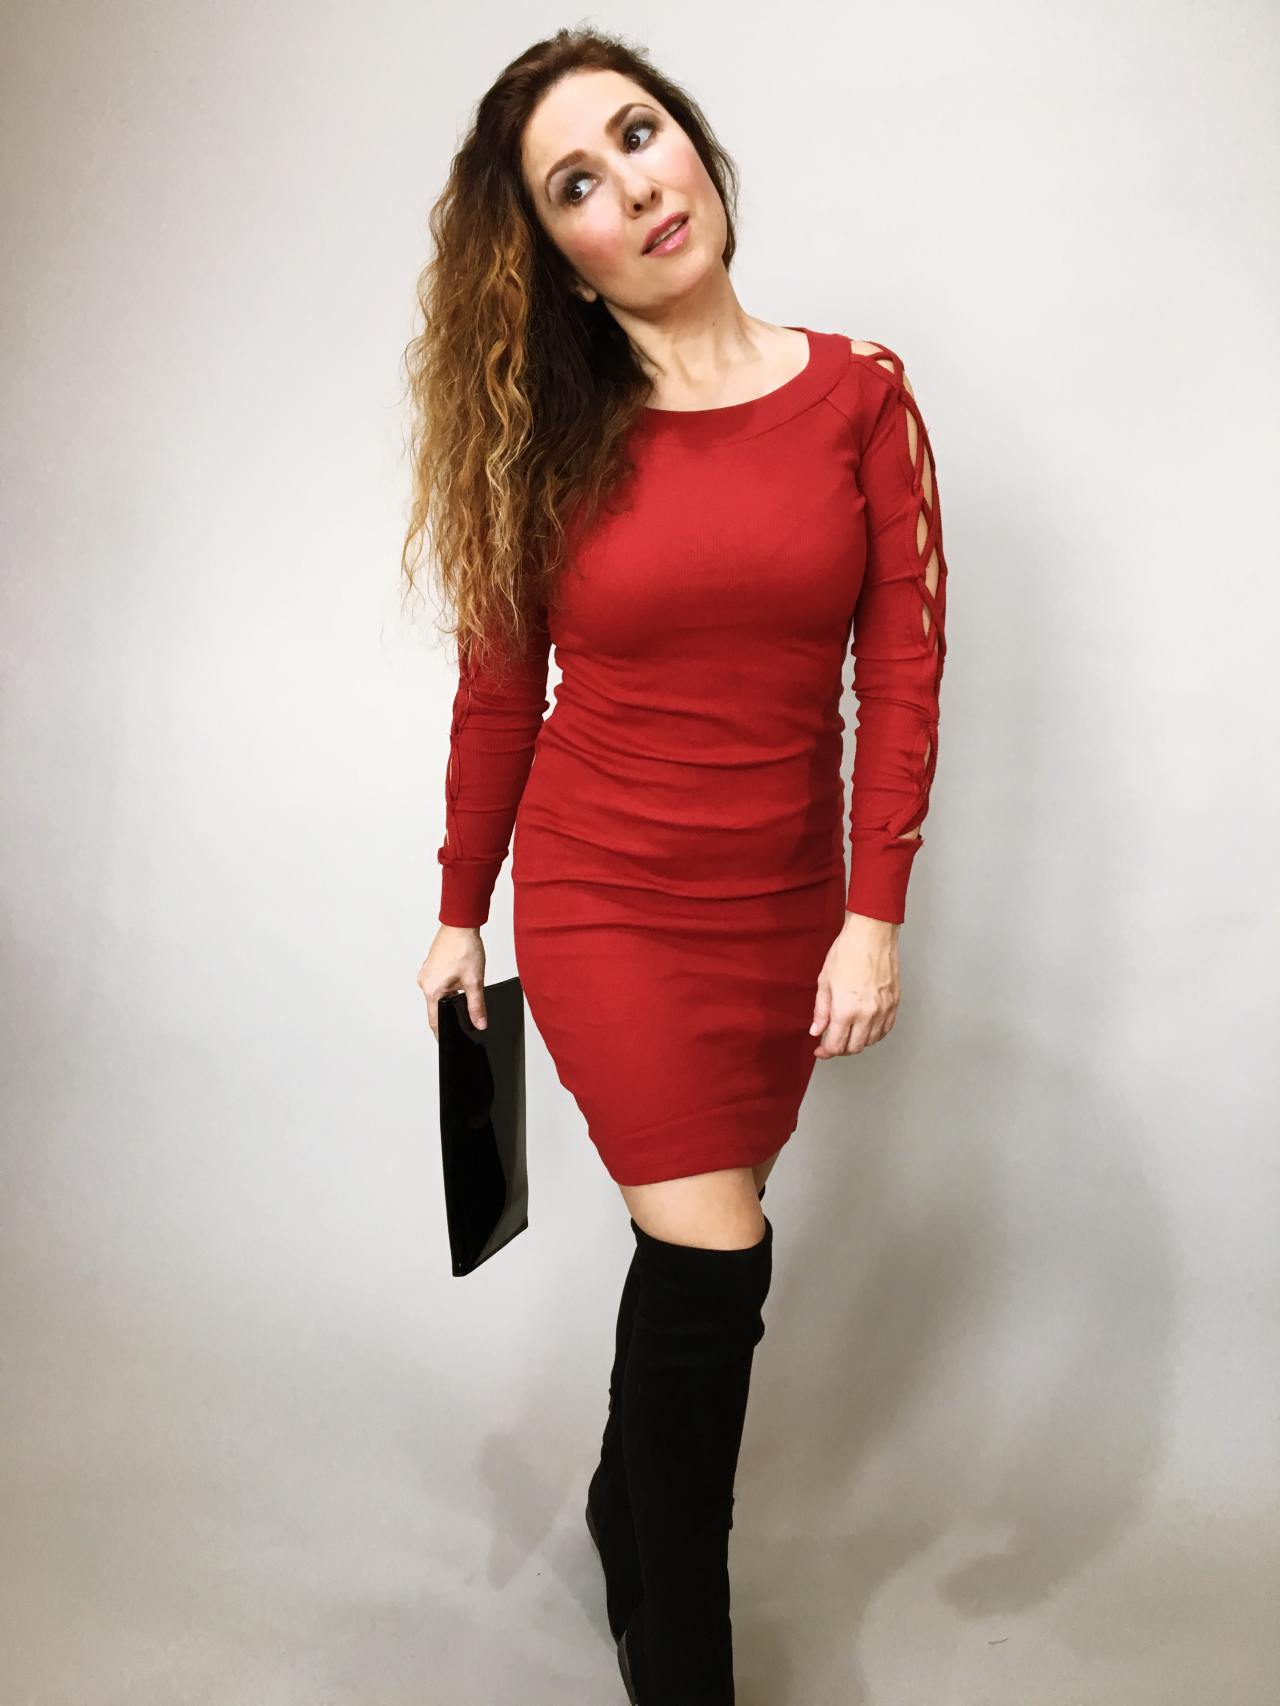 Šaty Anne bordó 02